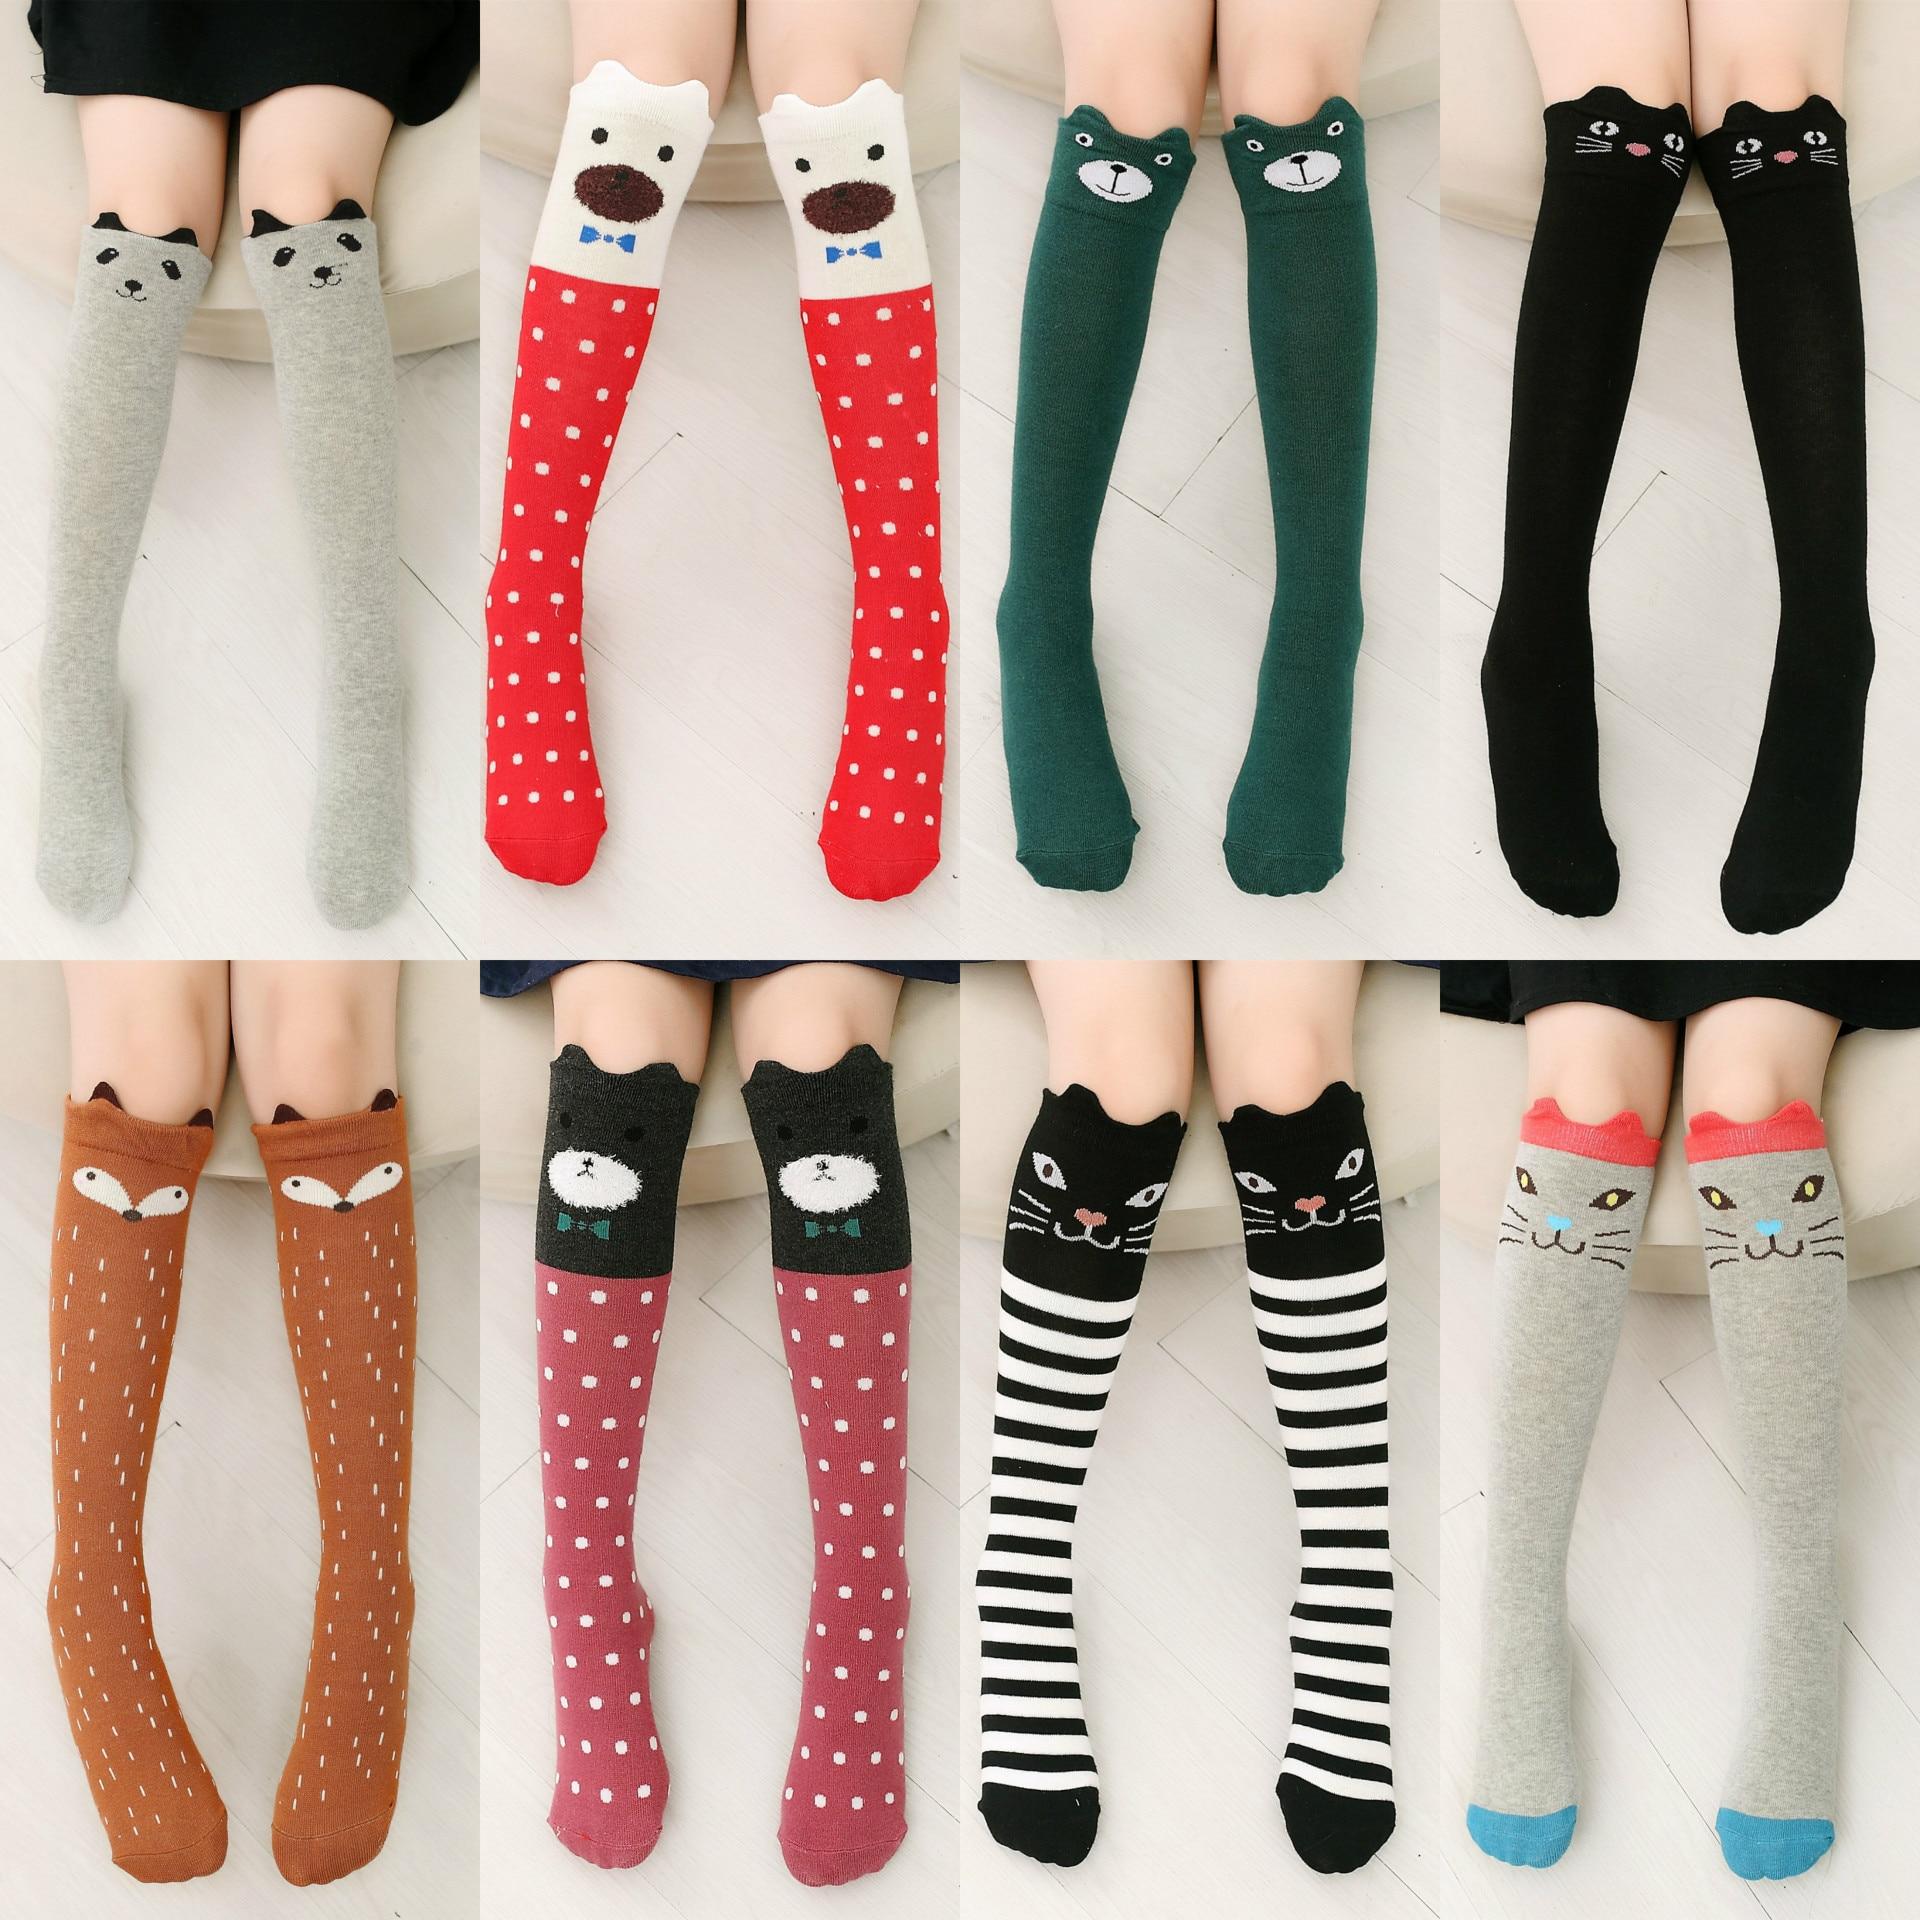 Kids Baby Girl Long Tights Toddler Soft Pantyhose Elastic Warm Stockings Socks